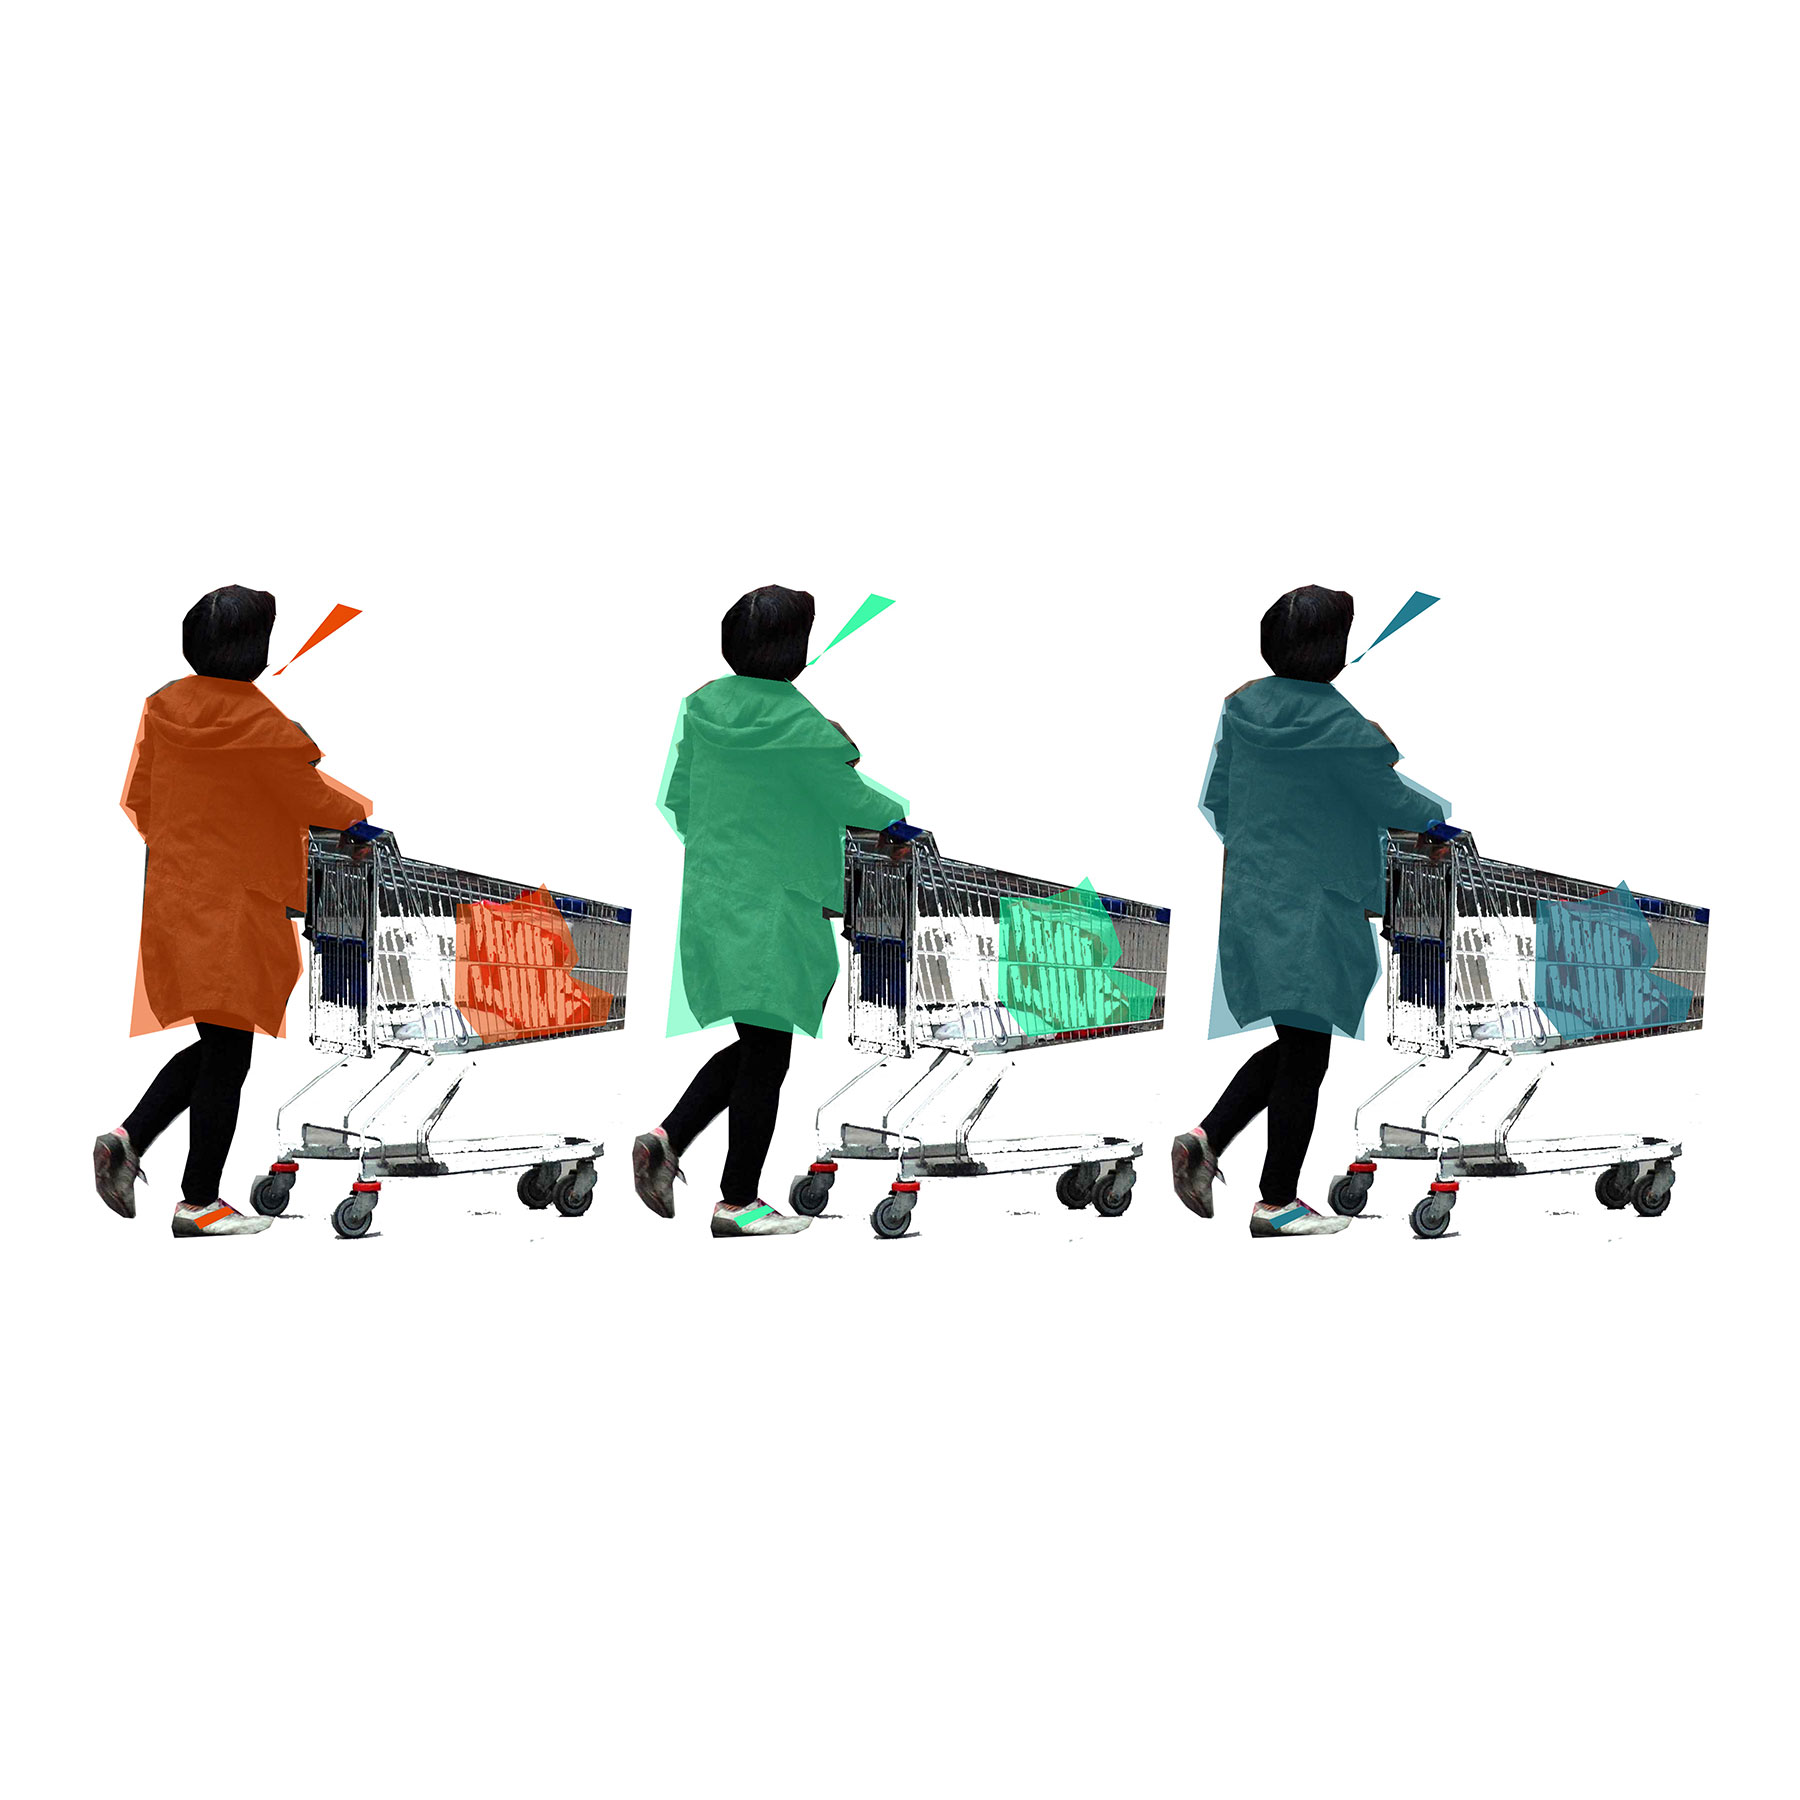 zbook_shoppingcart_sq_w.jpg